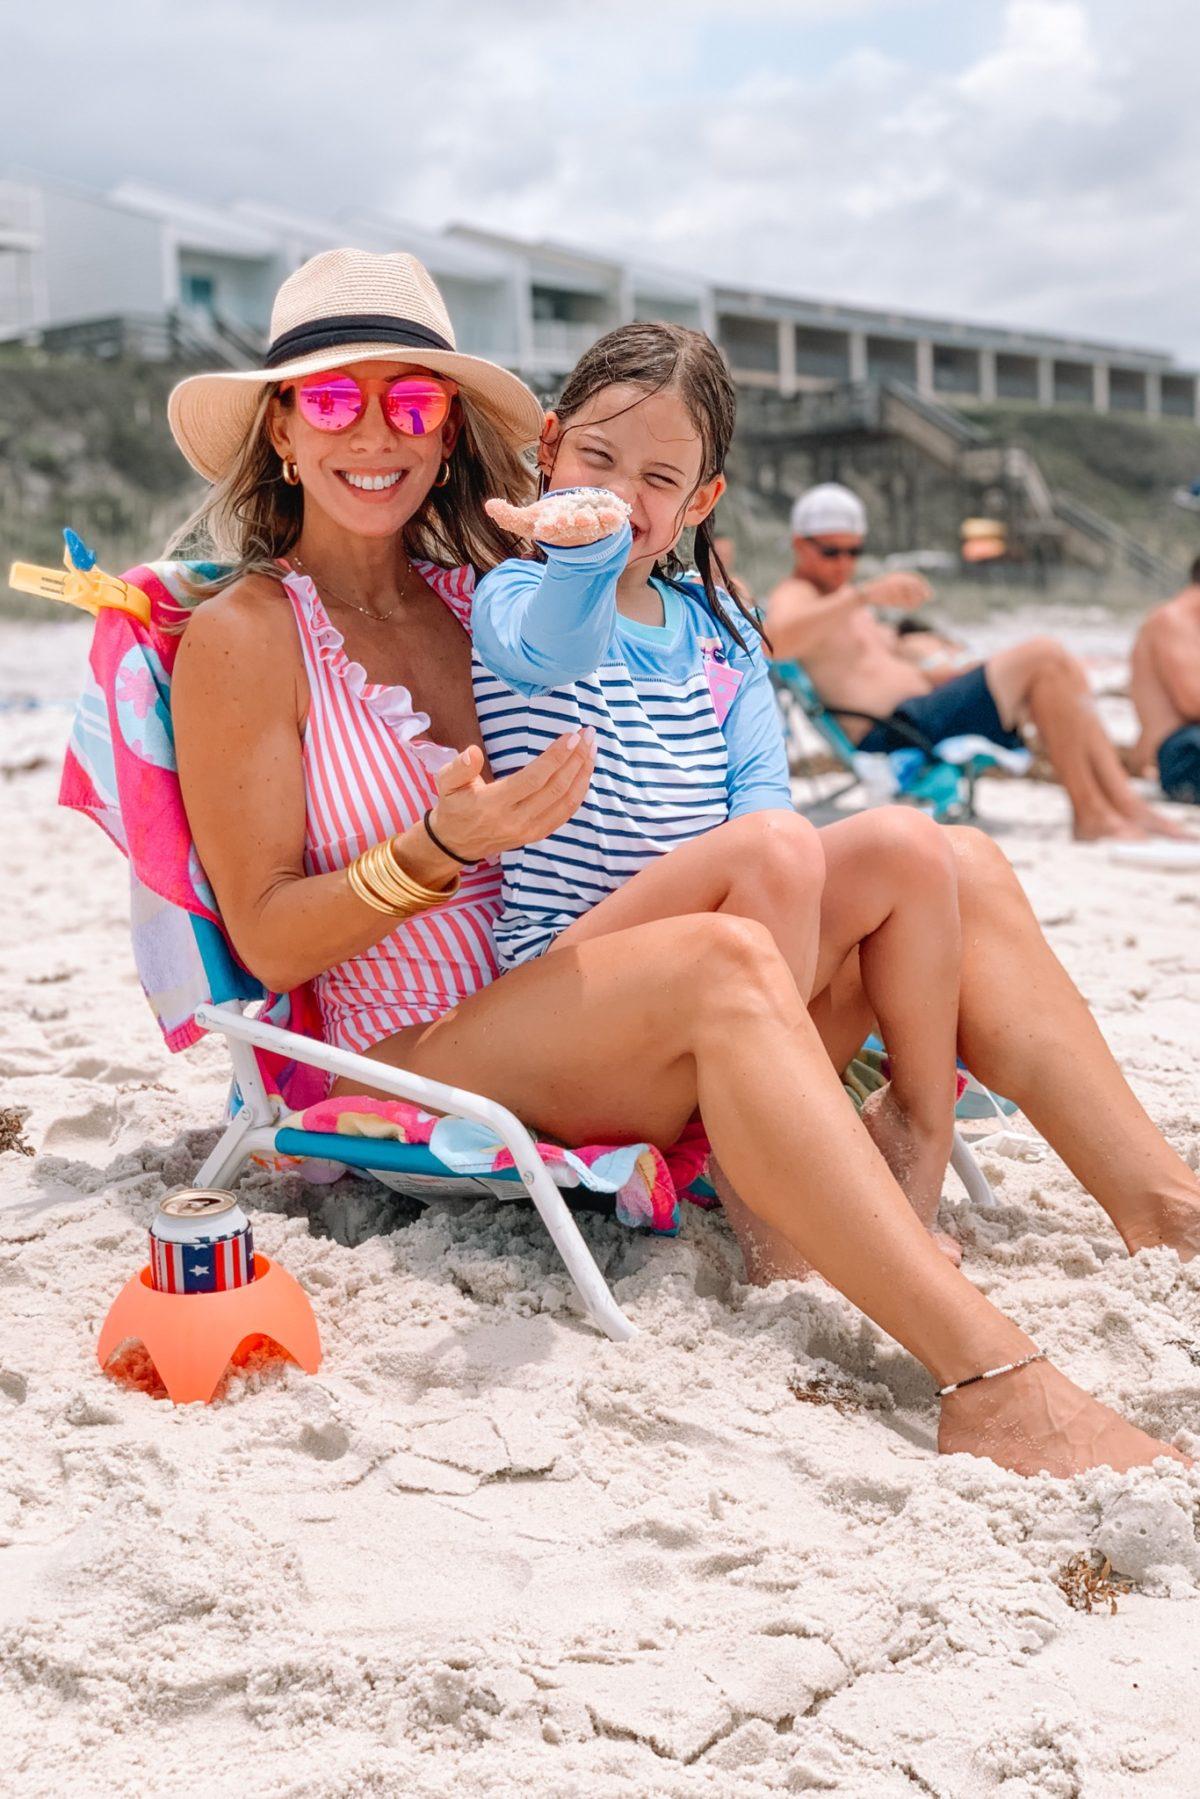 Goodr Sunglasses, Sun Hat, Striped Swimsuit, Cup Holder